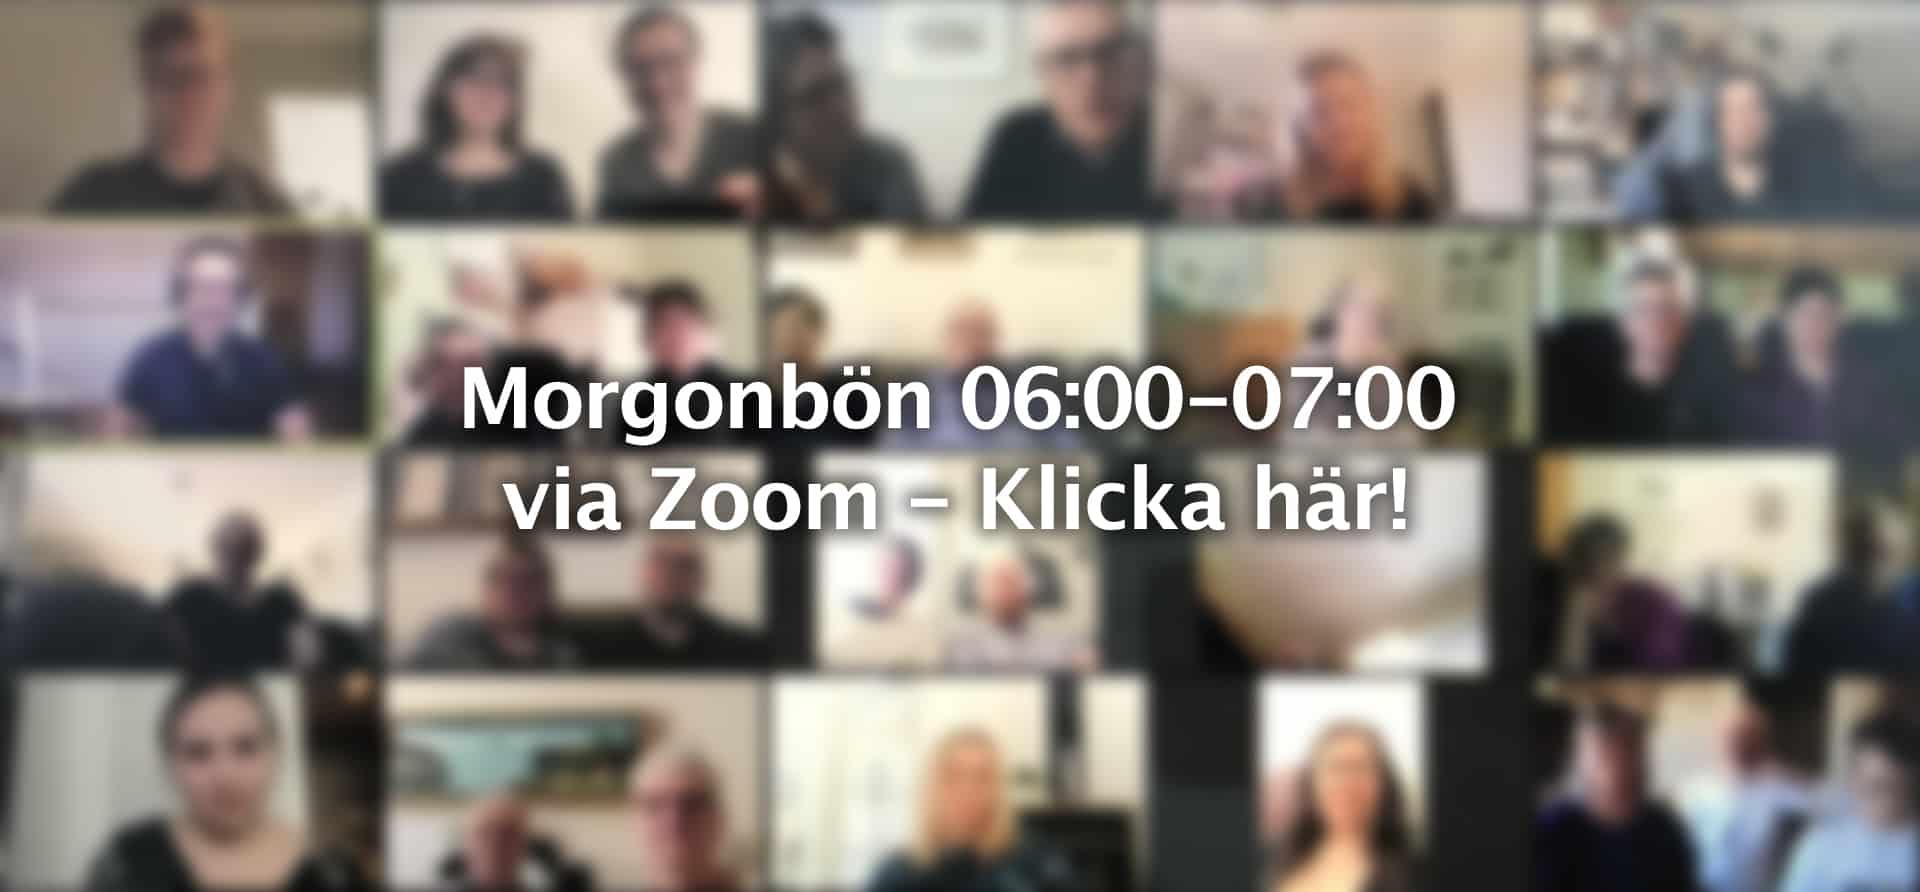 Zoom morgonbön